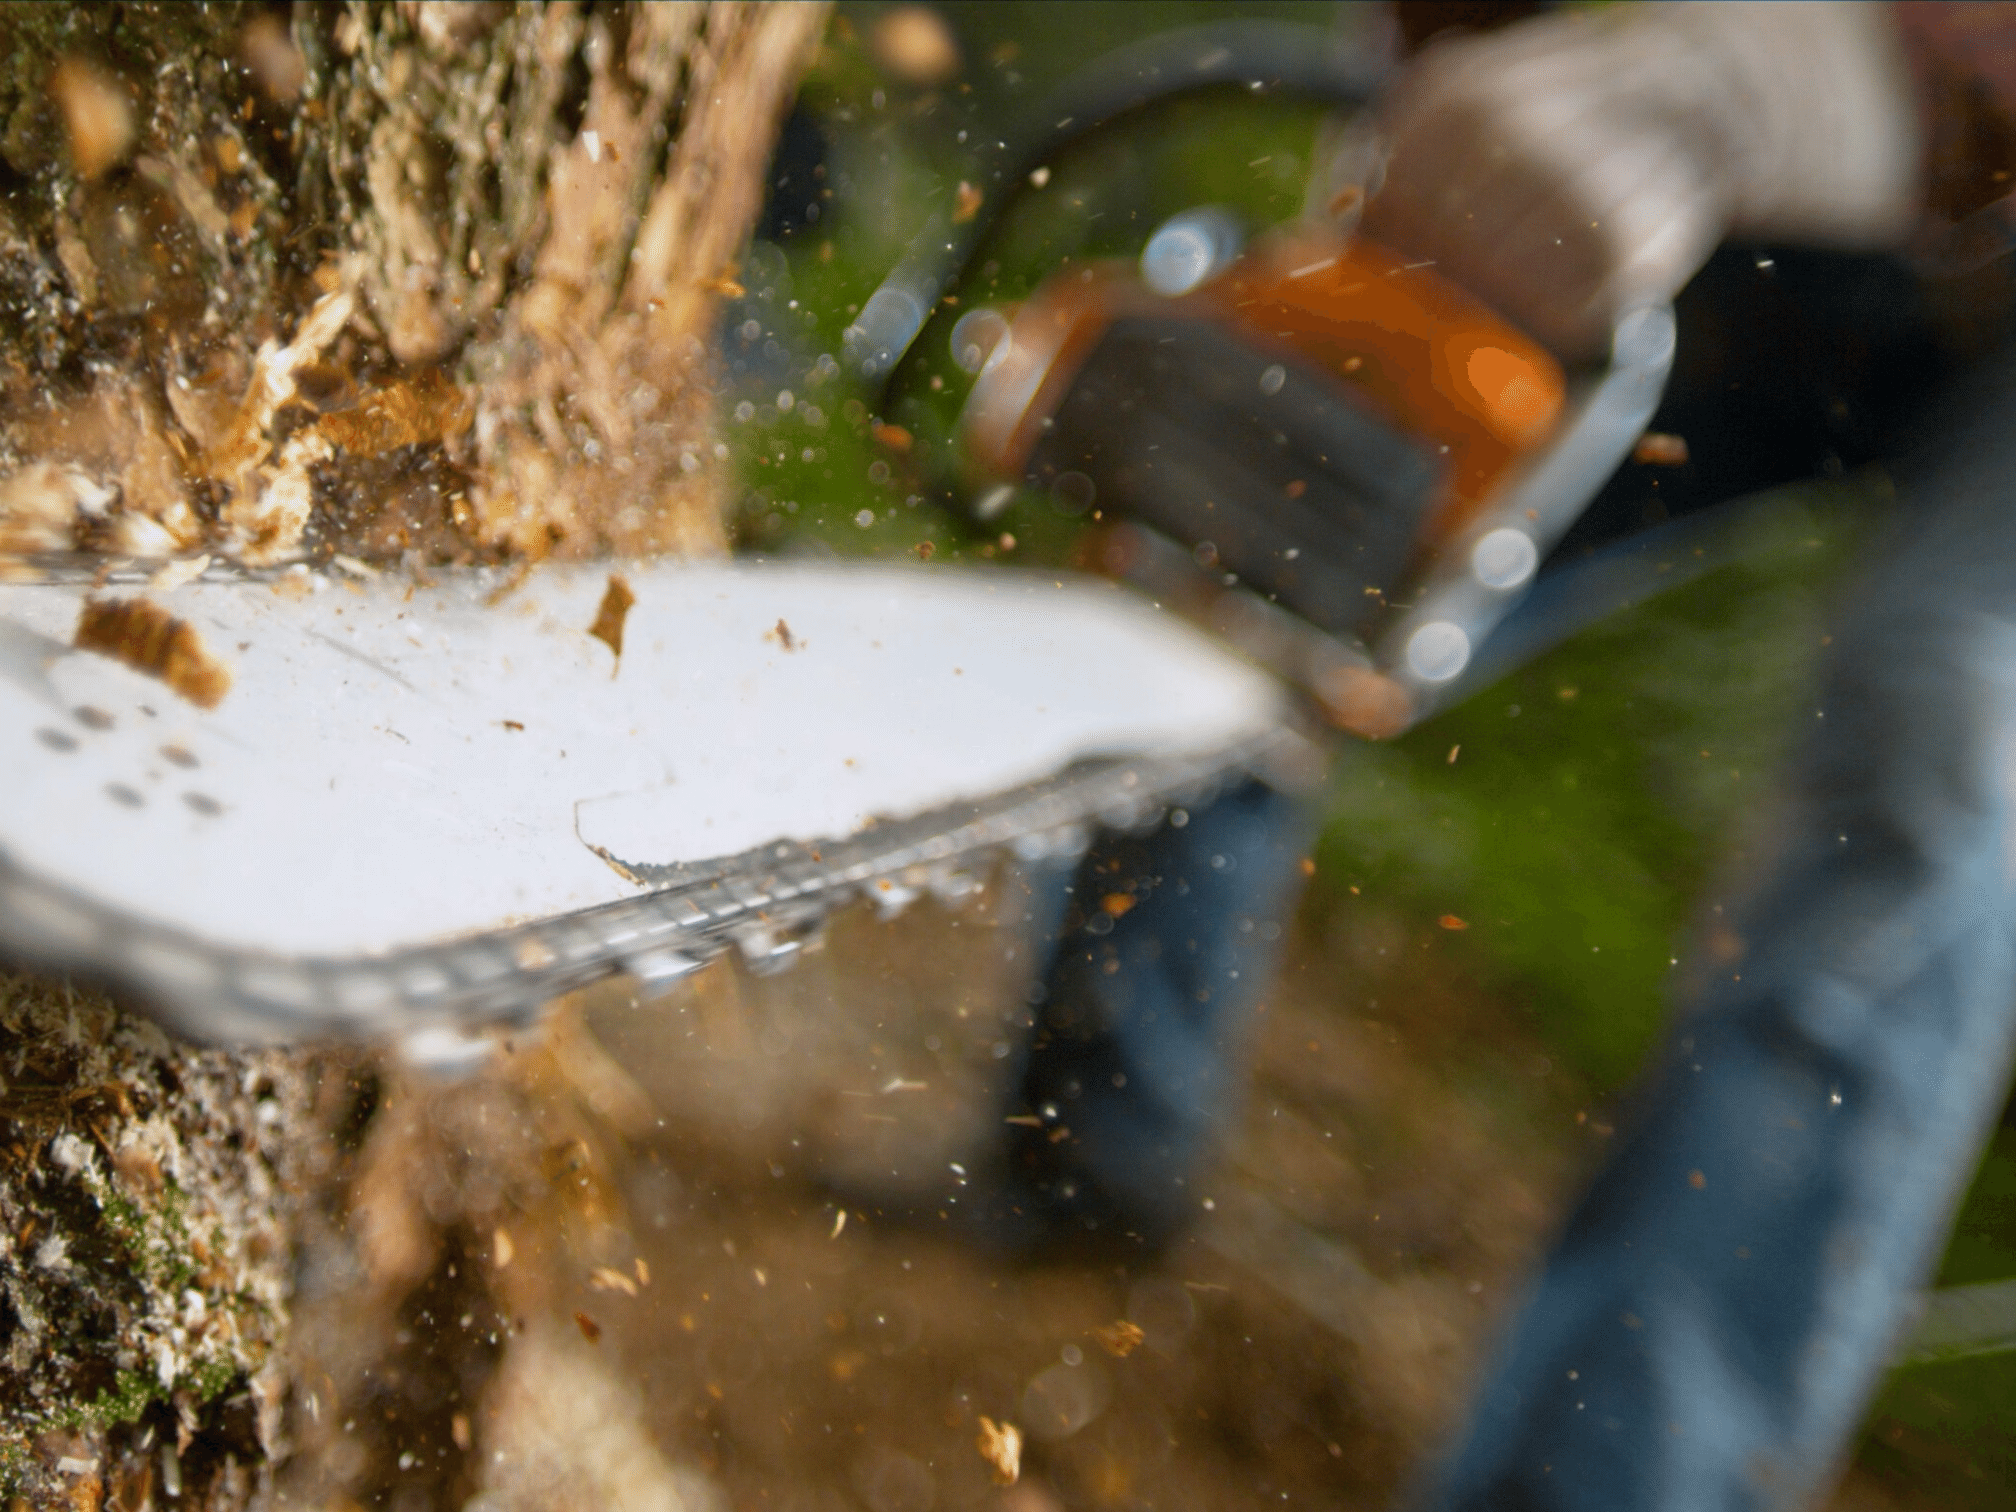 Logging the Tarkine threatens Tasmania's health and economy, doctors say